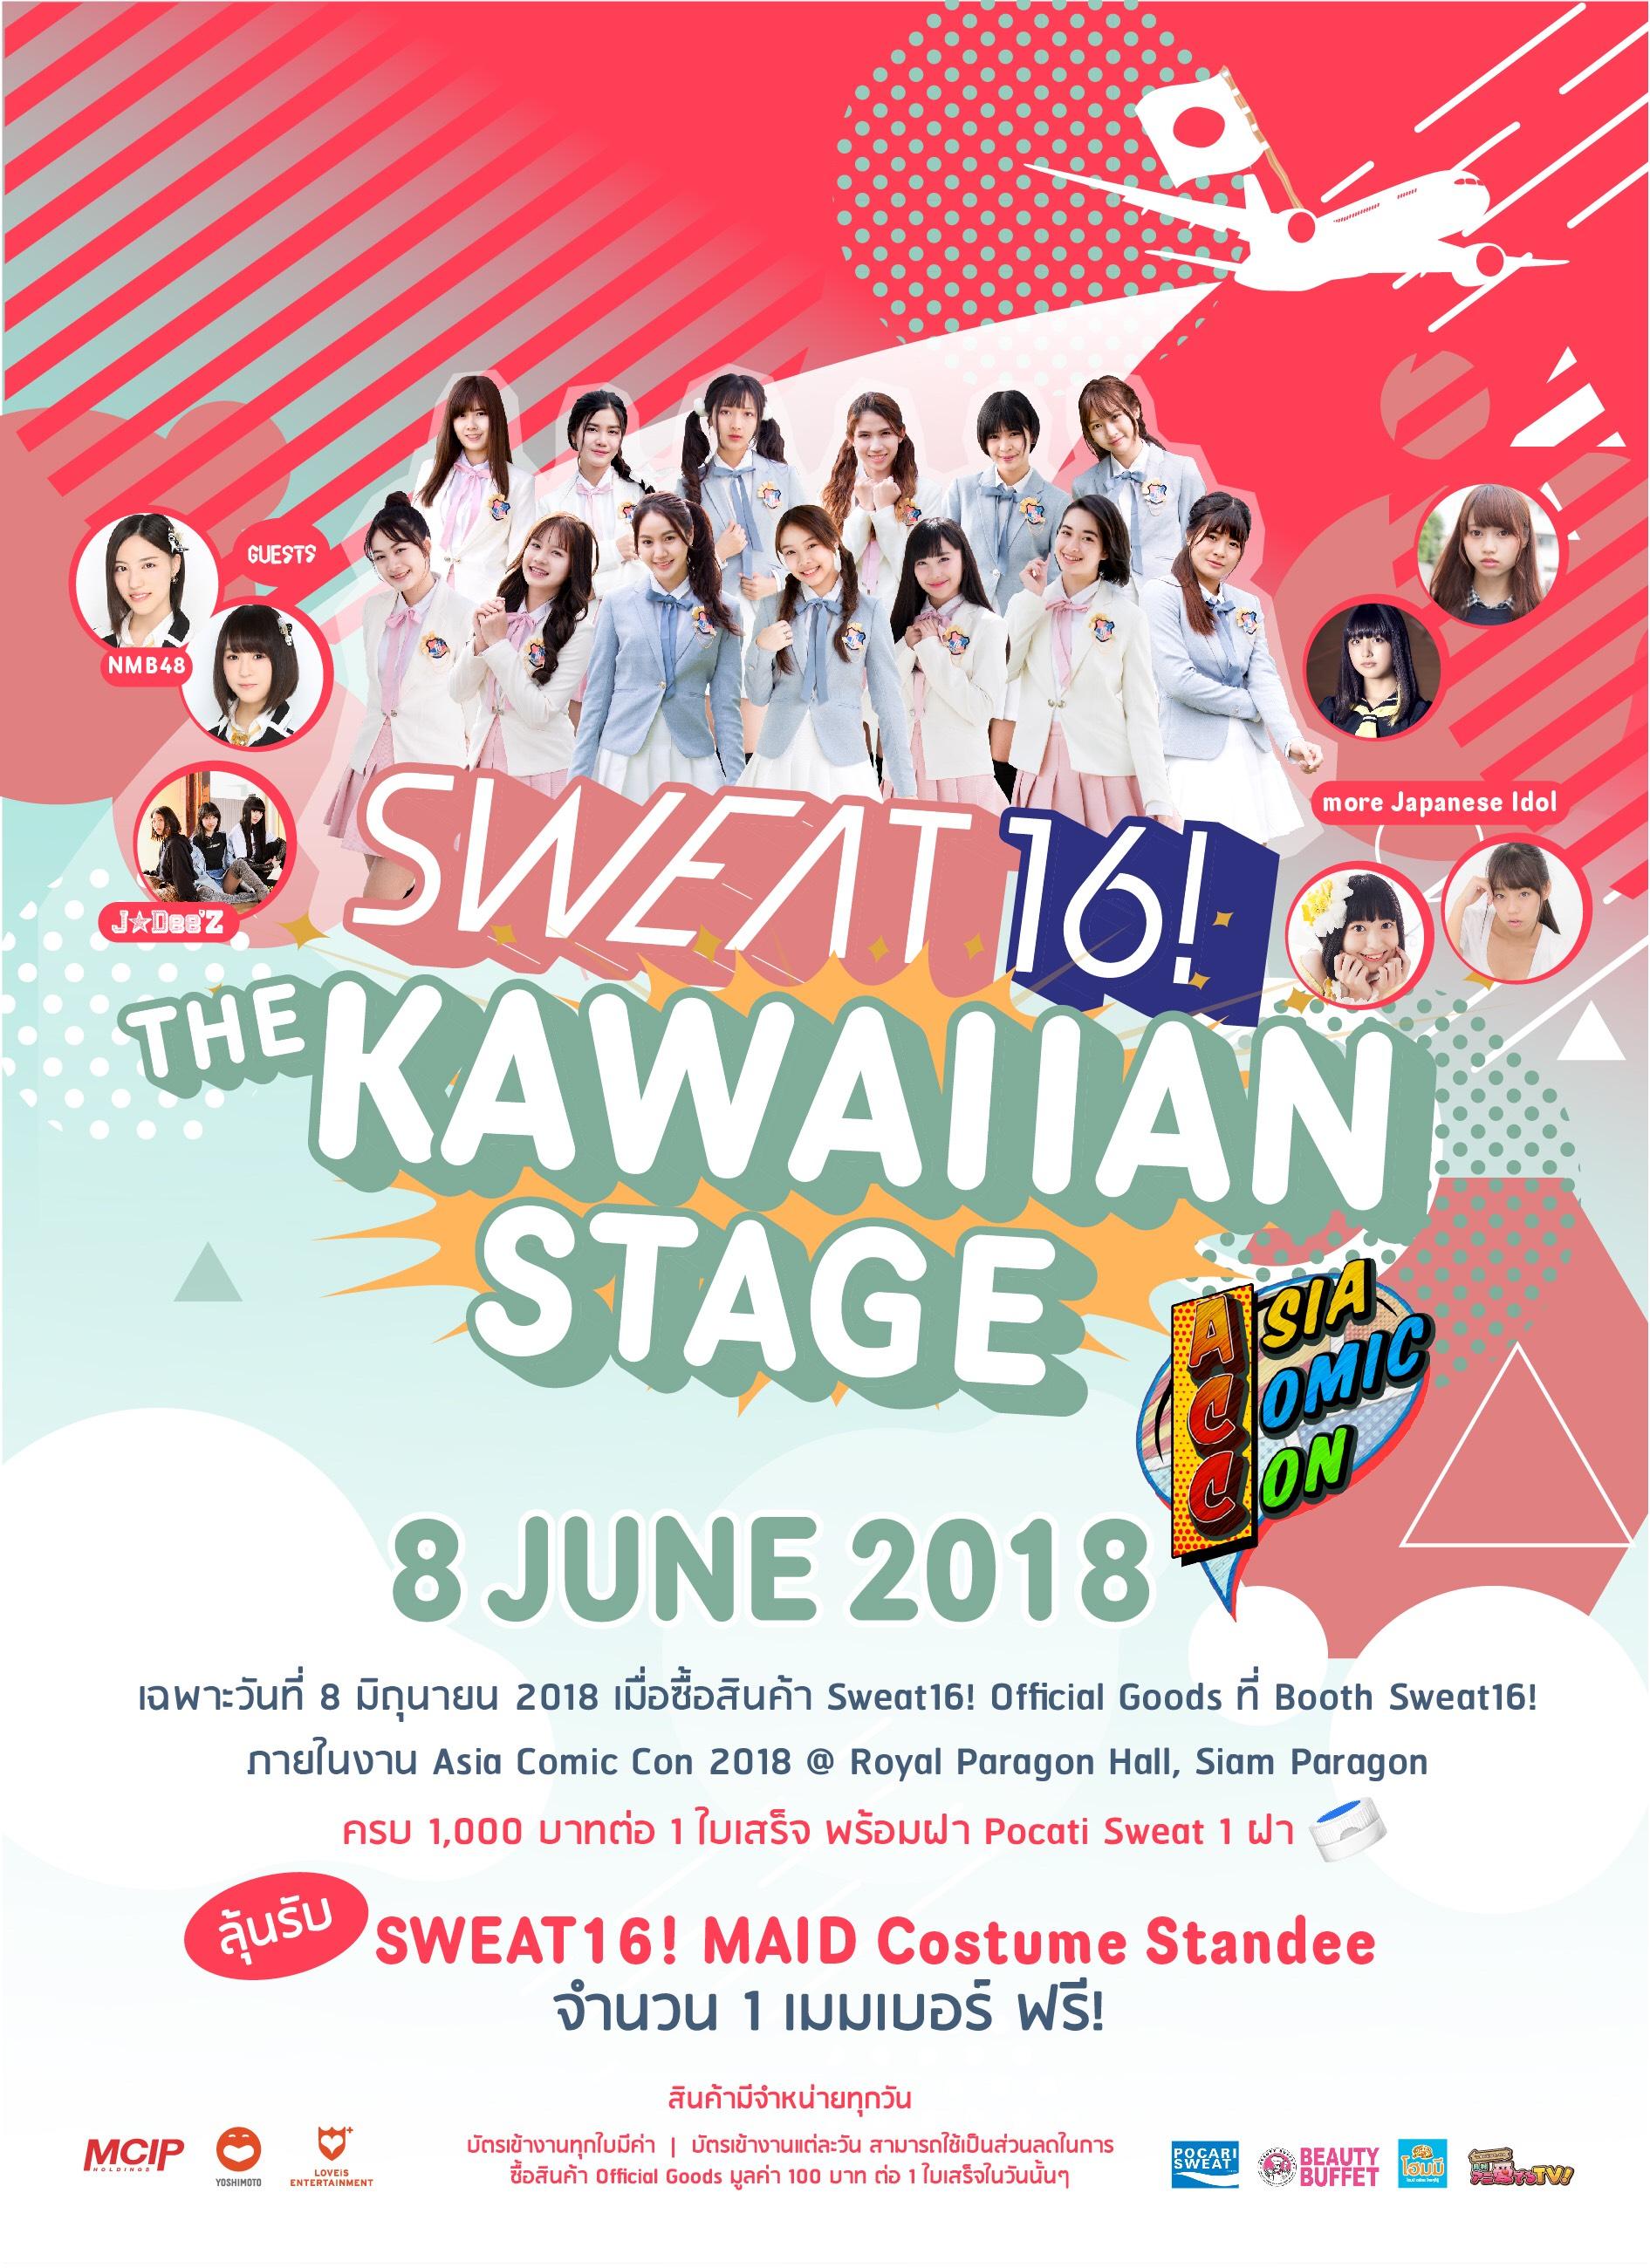 SWEAT16! The KAWAiiAN Stage